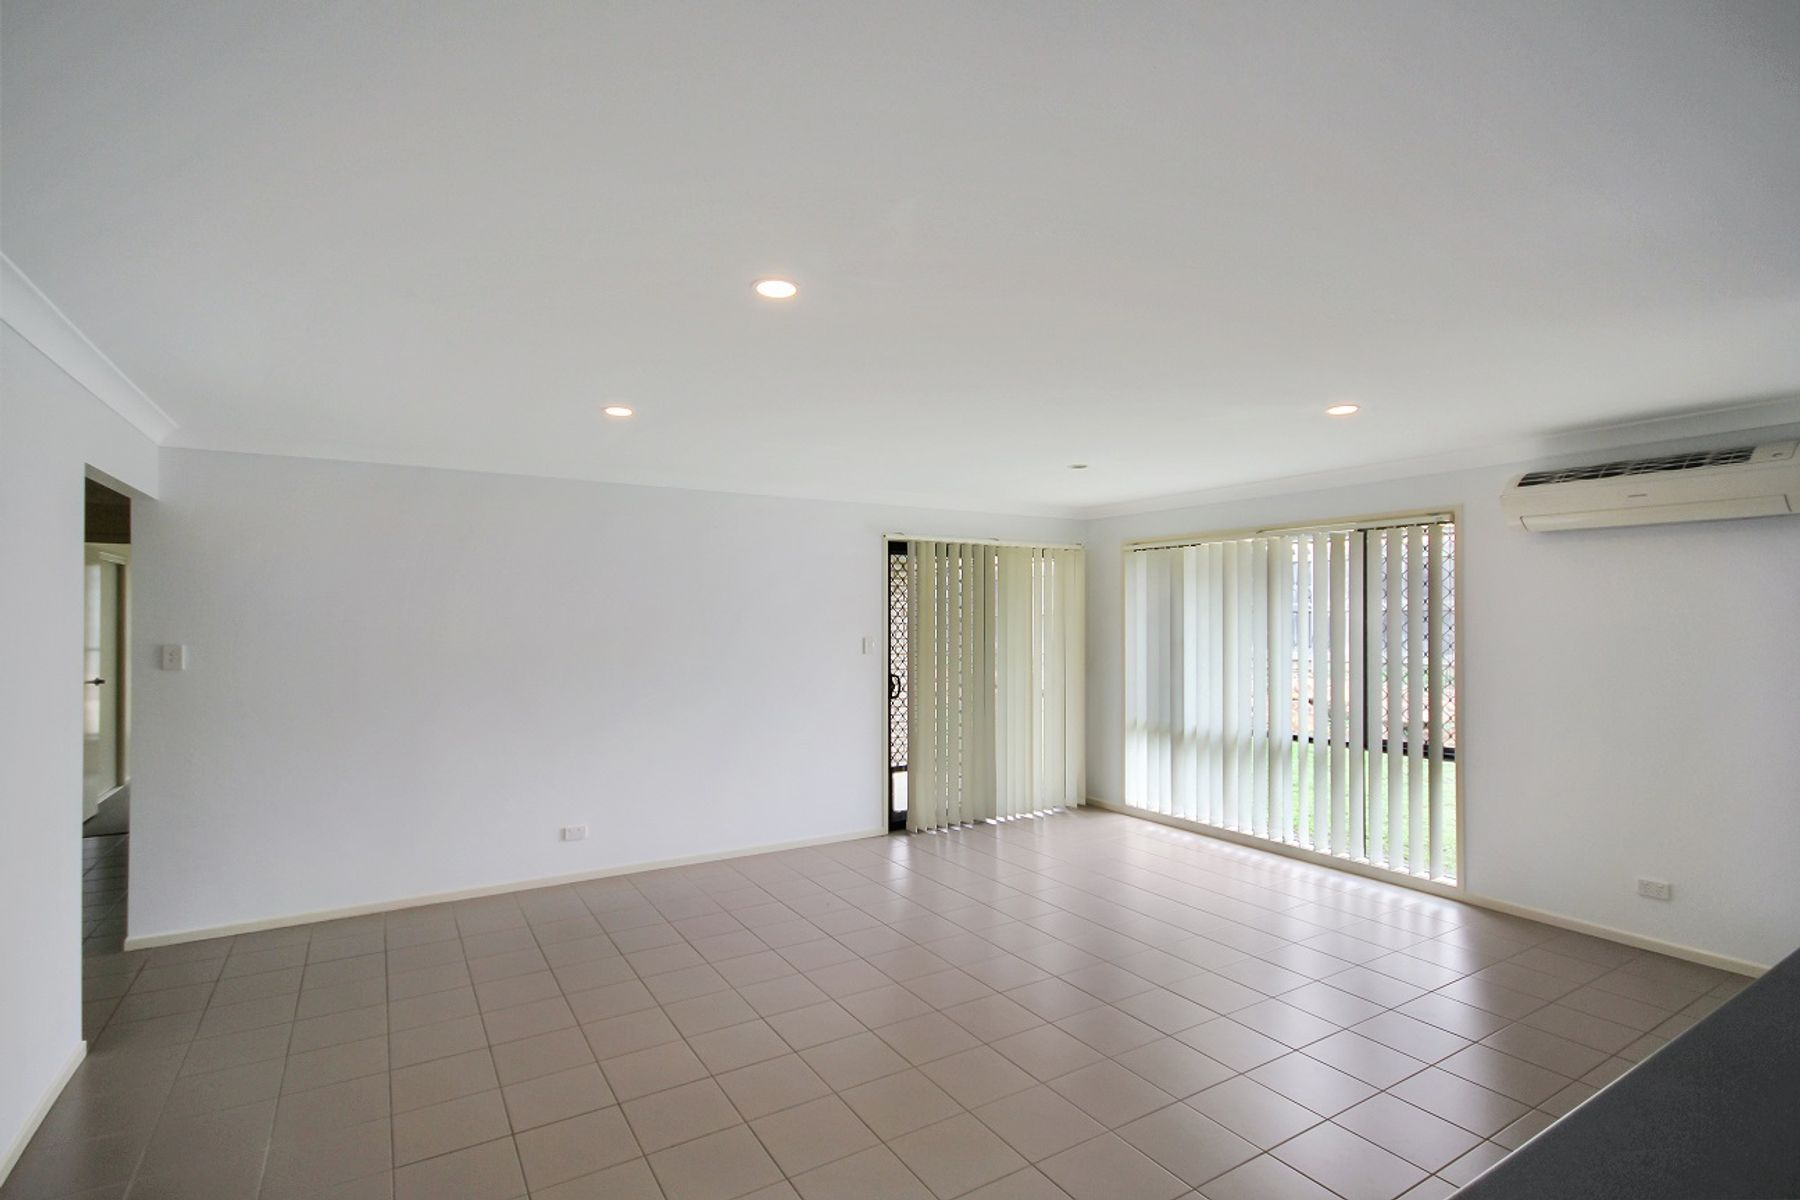 100 Heritage Drive, Brassall, QLD 4305